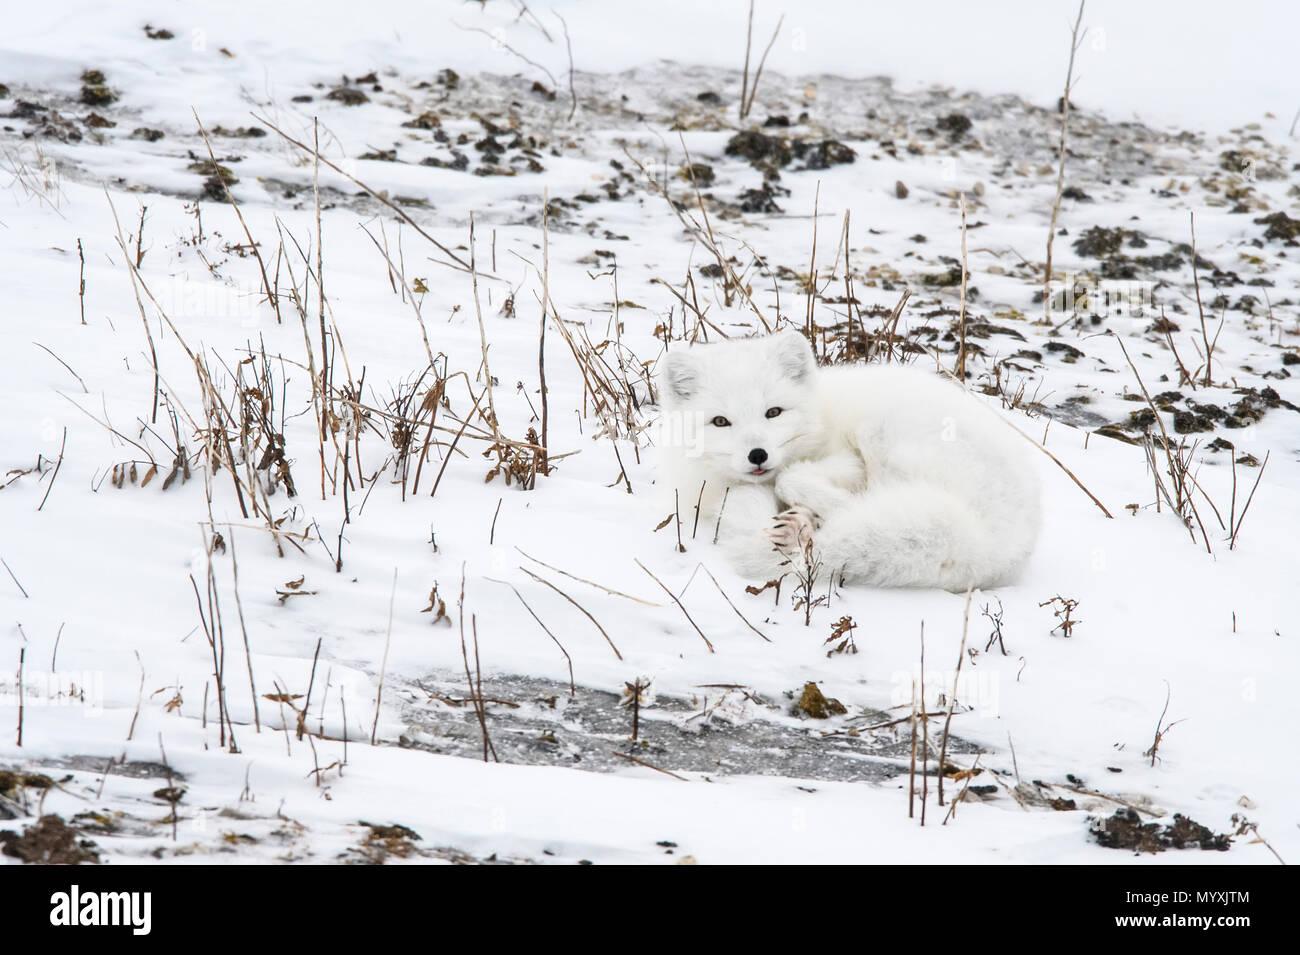 Arctic fox (Vulpes lagopus) Resting on Hudson Bay coastal beach, Wapusk National Park, Cape Churchill, Manitoba, Canada Stock Photo